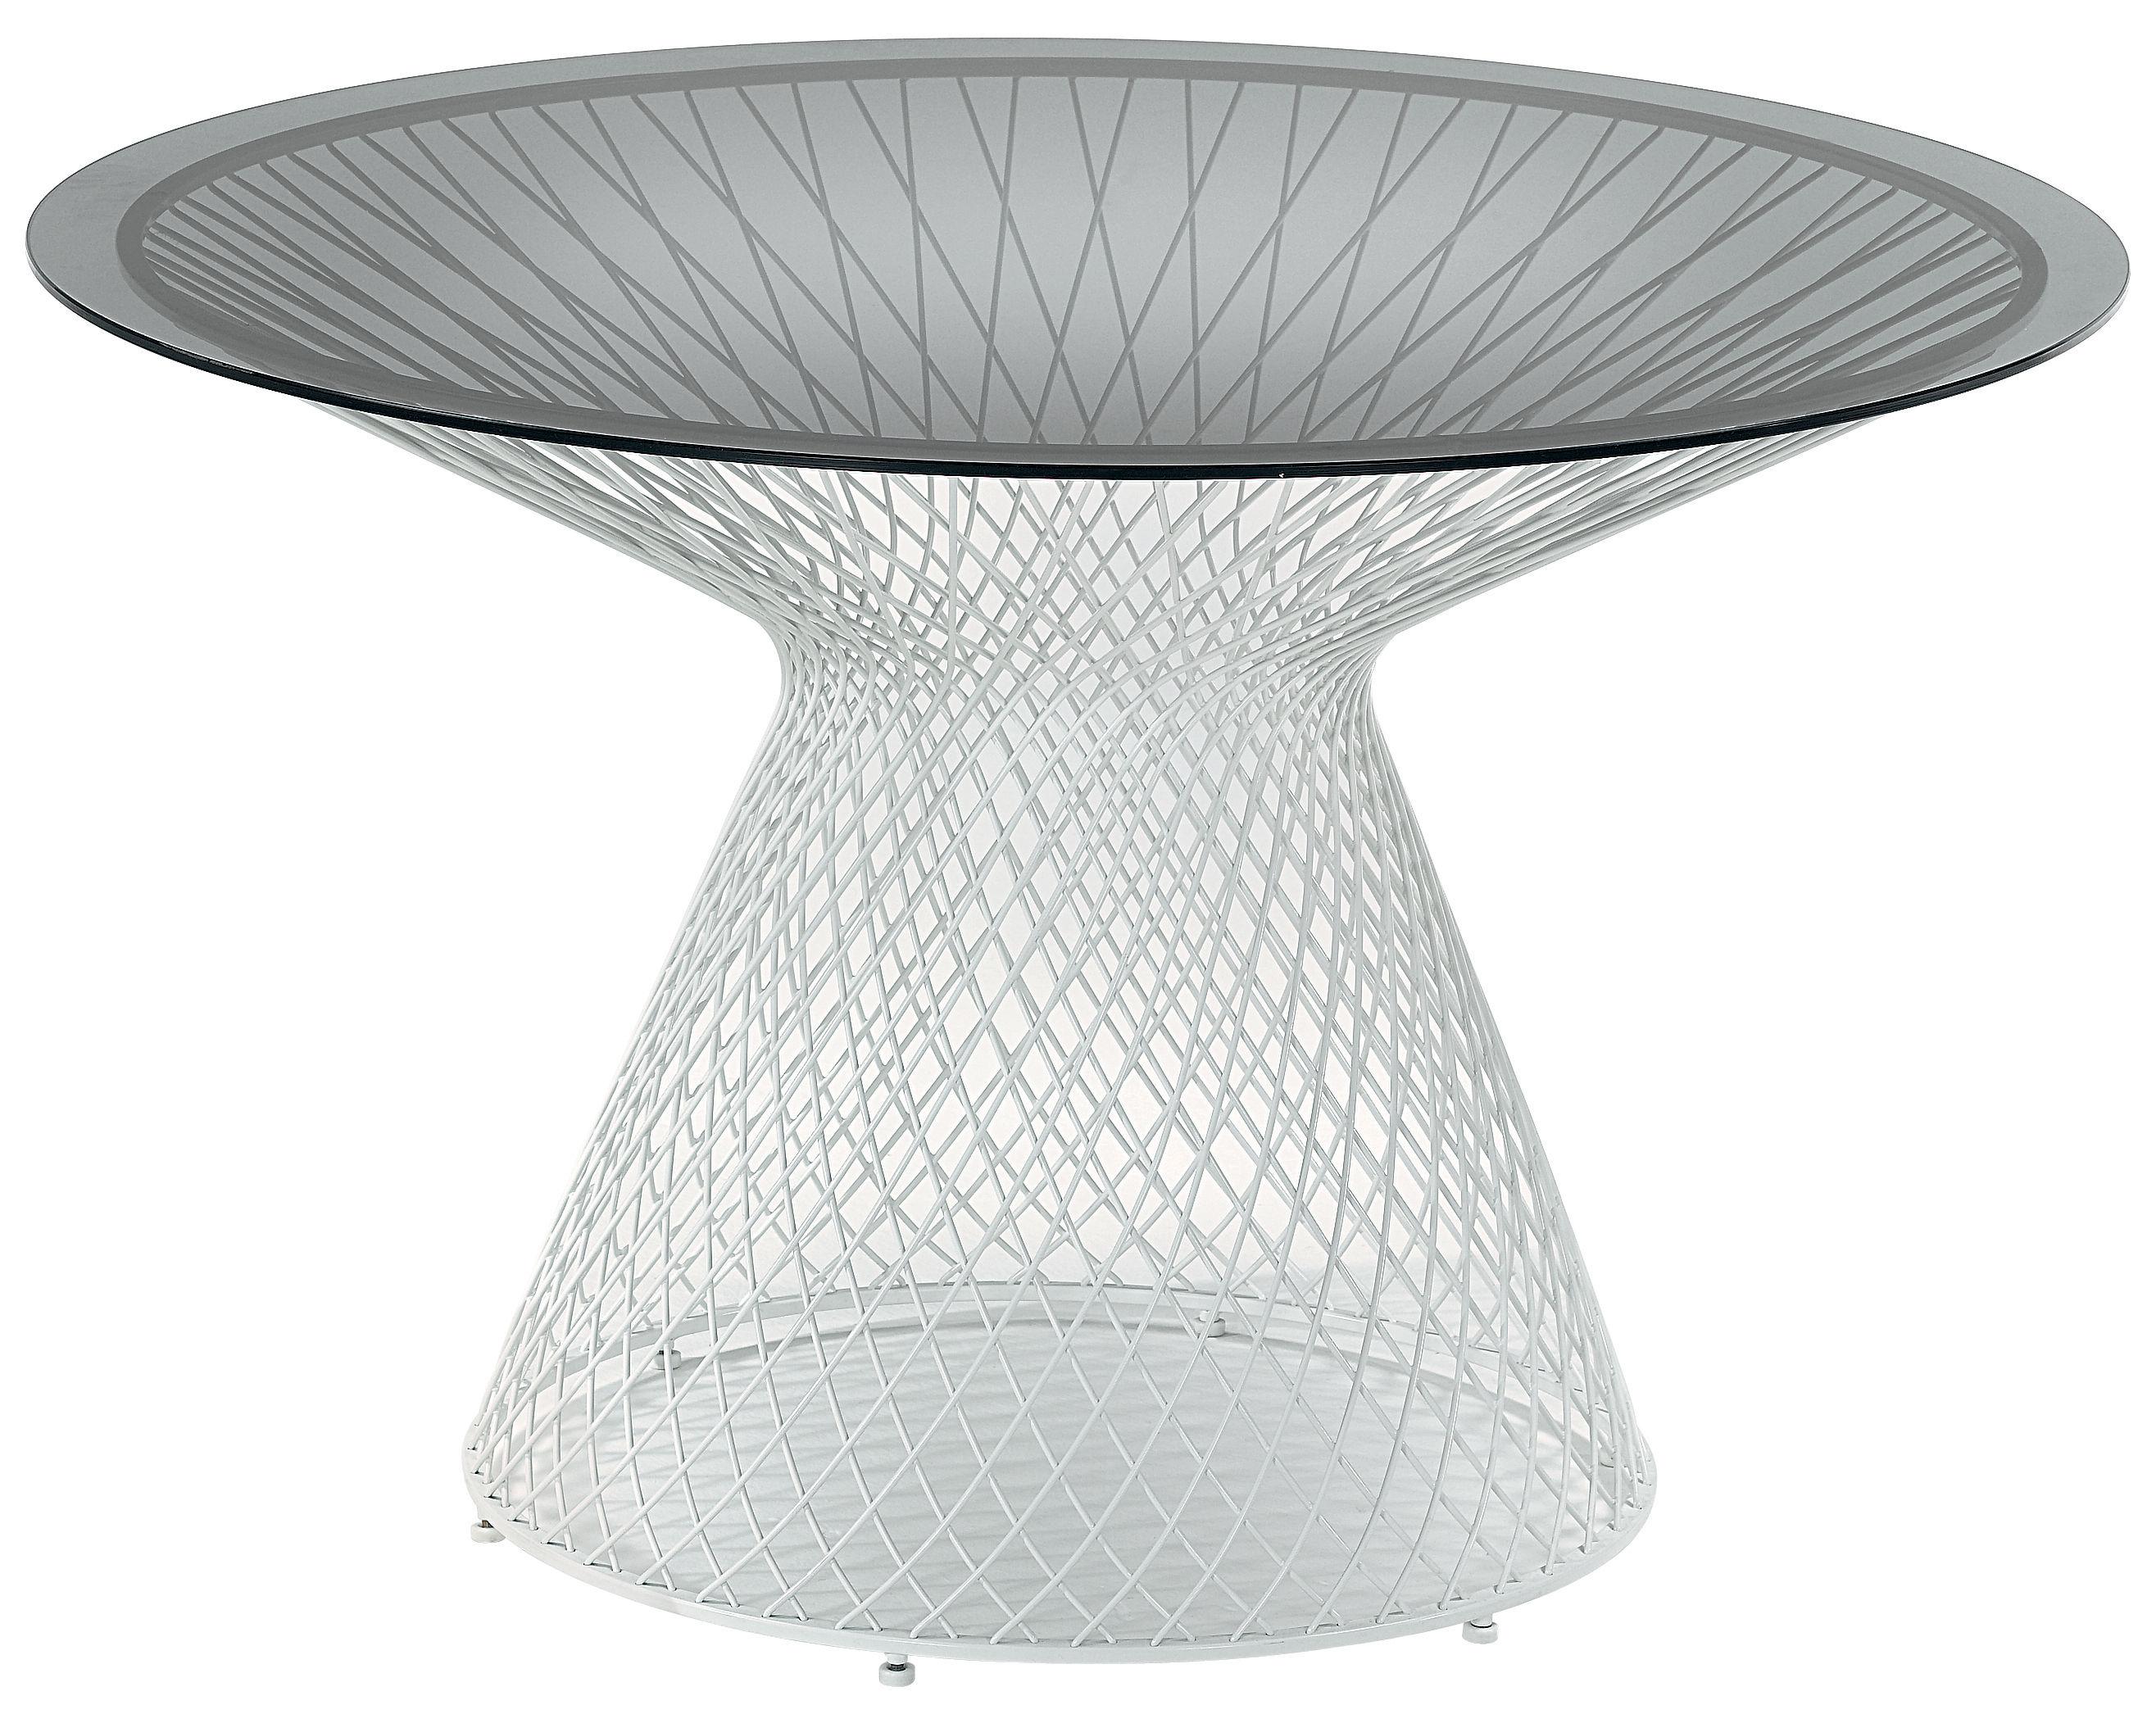 Outdoor - Tavoli  - Tavolo rotondo Heaven - Ø 120 cm di Emu - Bianco - Acciaio, Vetro